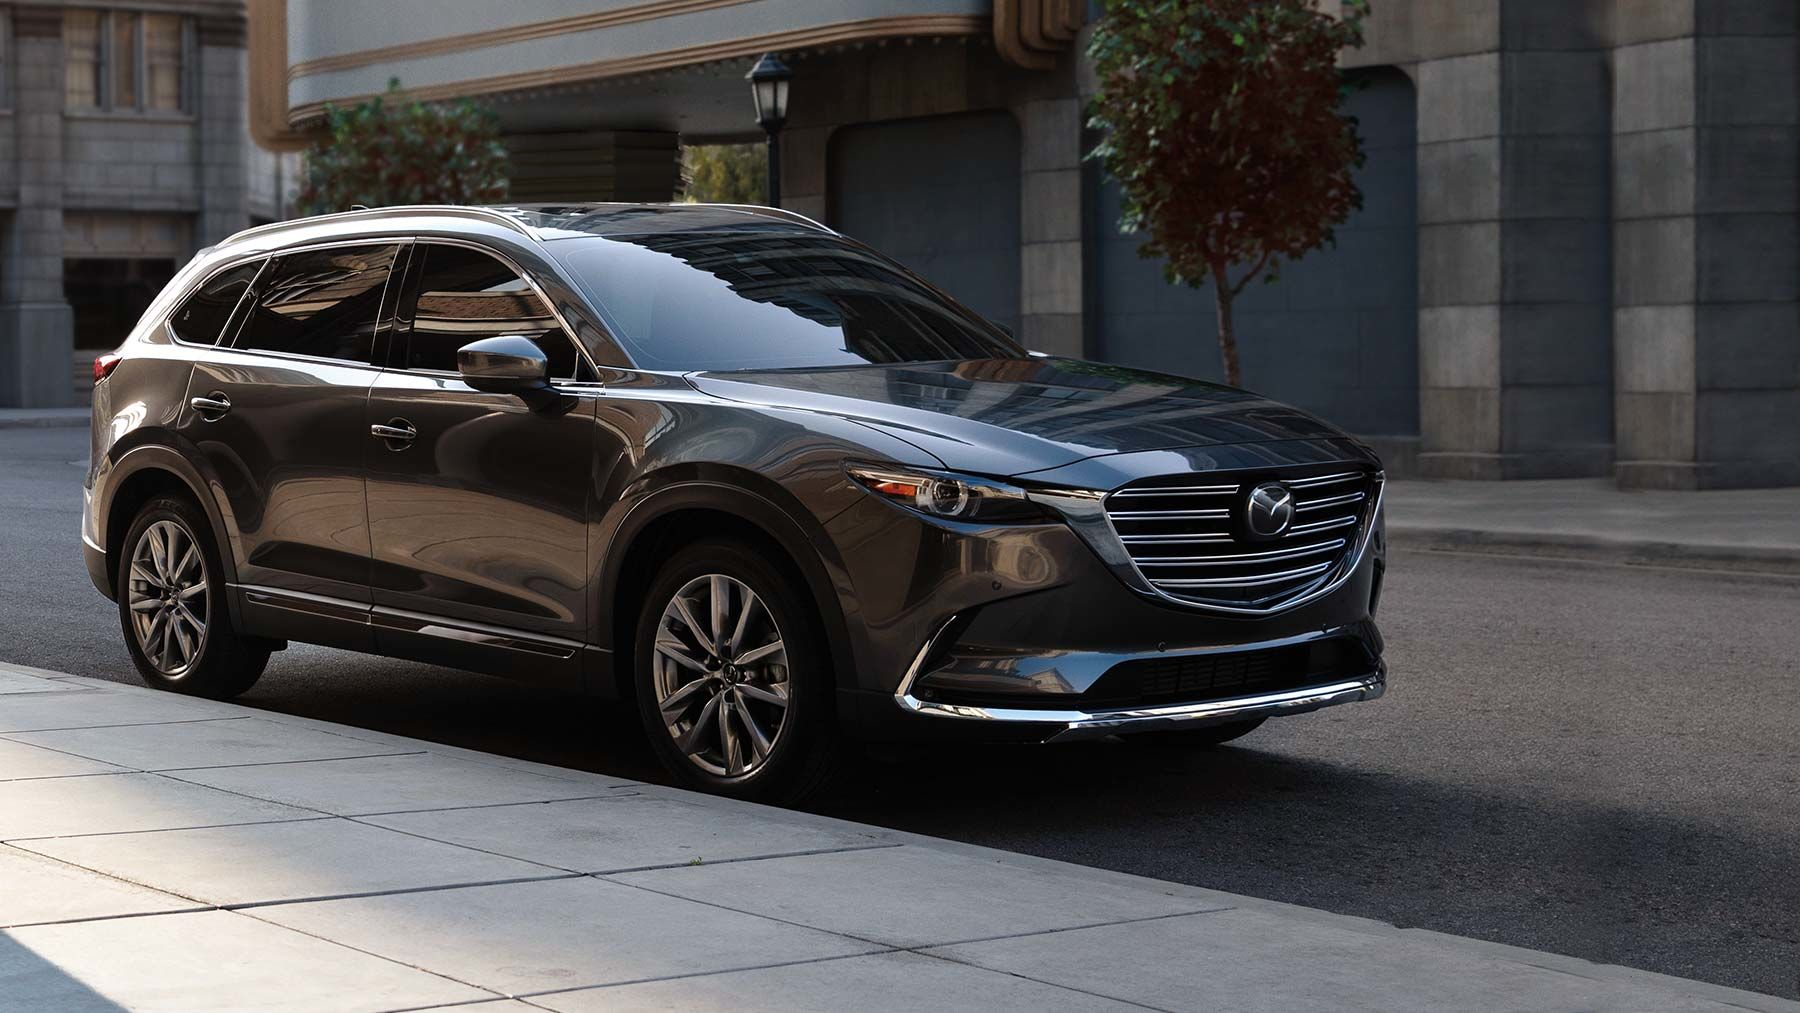 Kelebihan Mazda Cx 2019 Tangguh